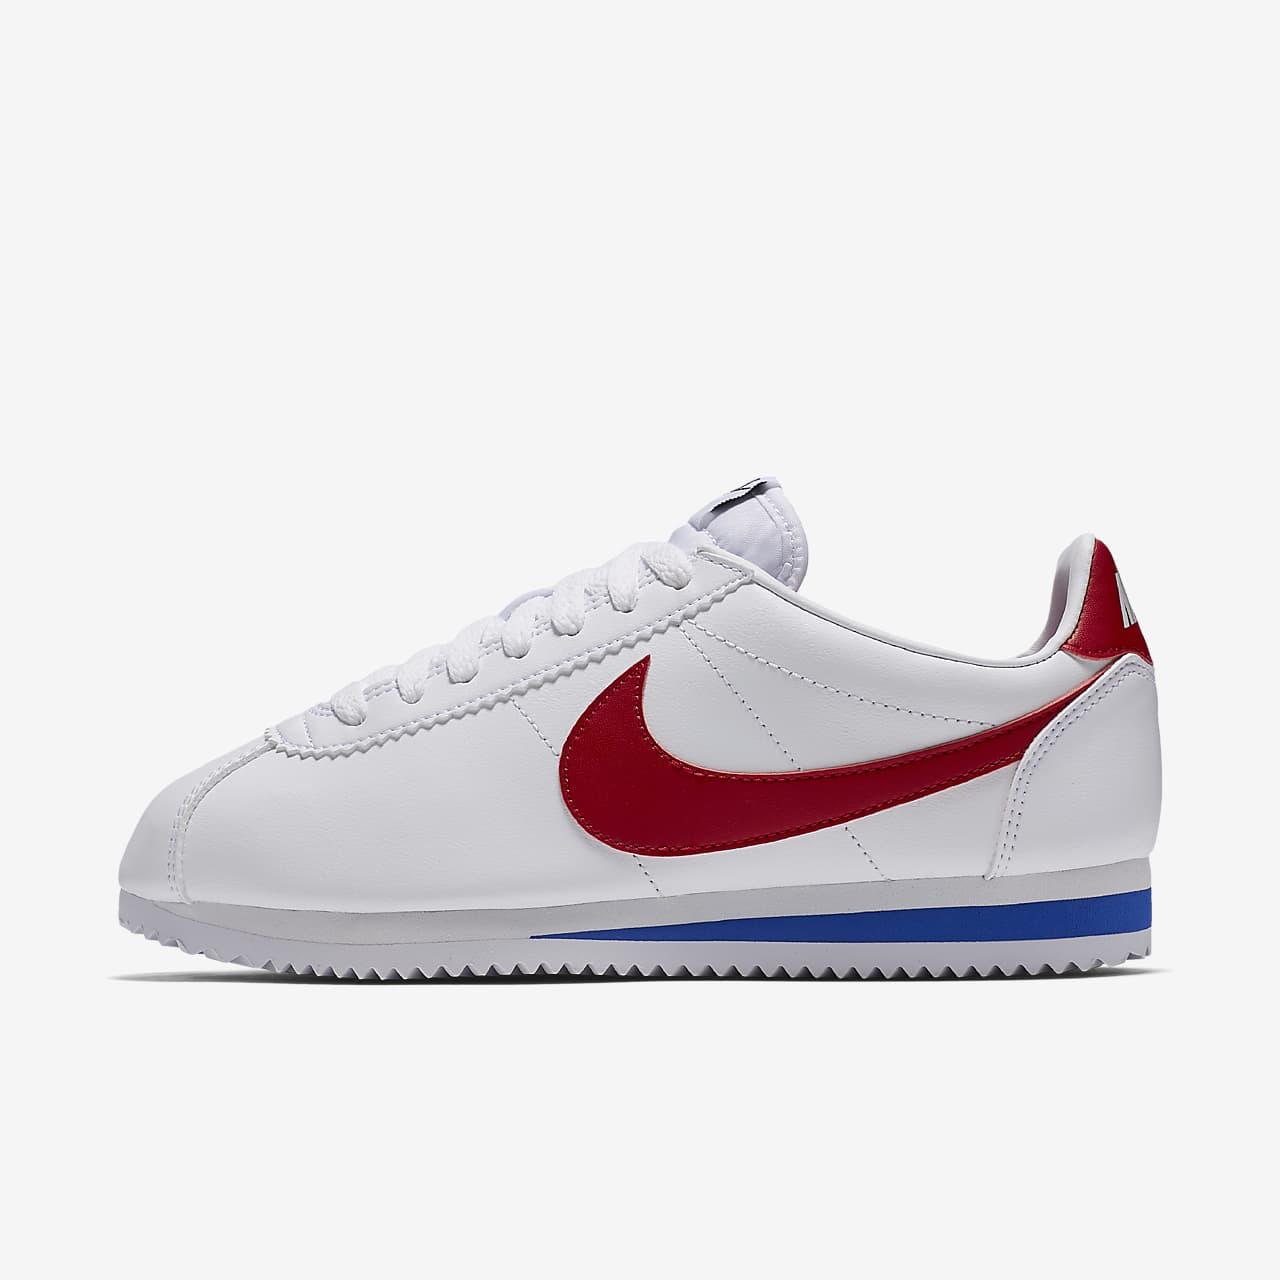 Sko Nike Classic Cortez för kvinnor